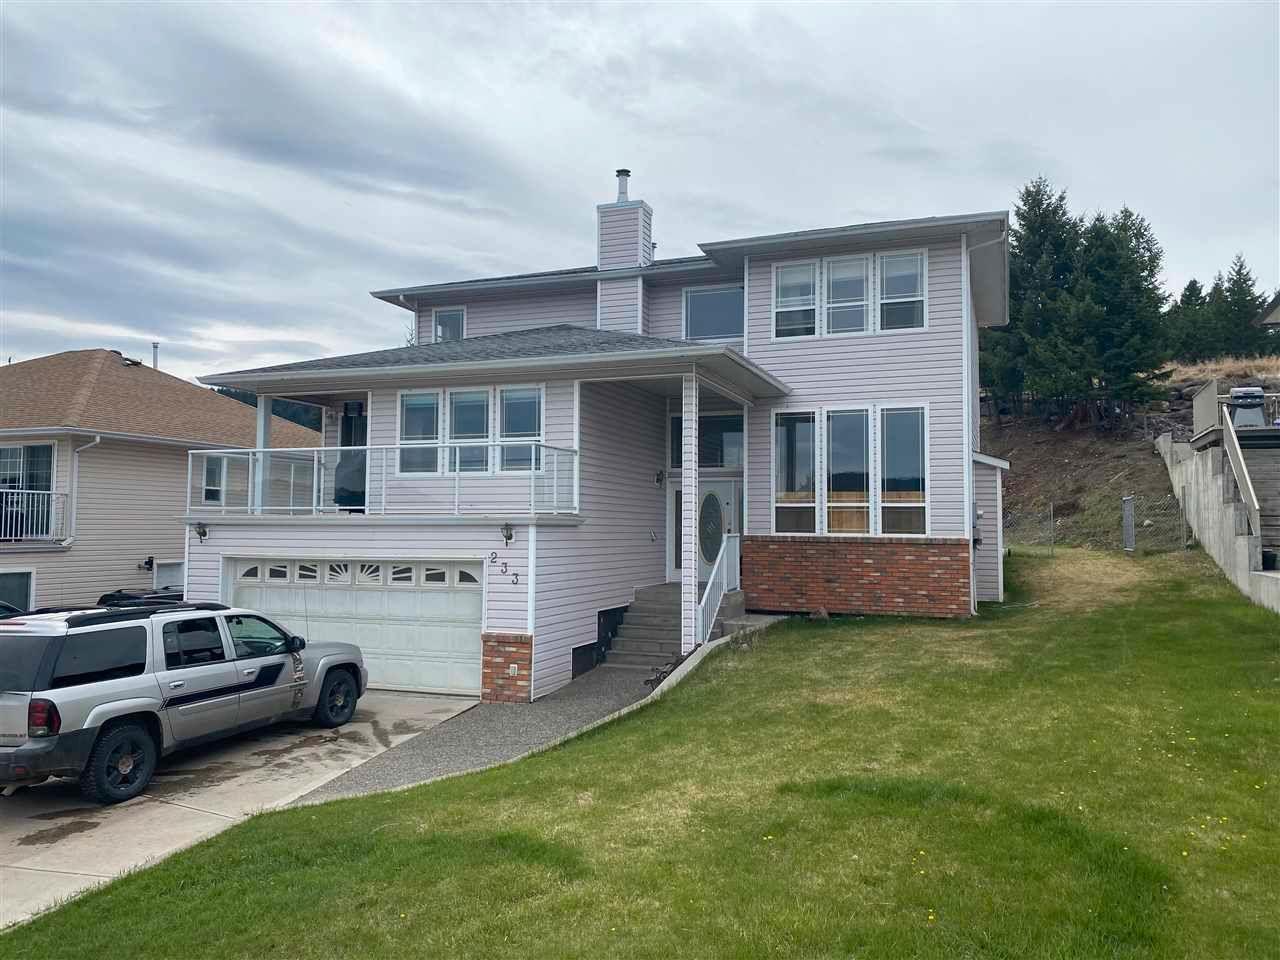 Main Photo: 233 WESTRIDGE Drive in Williams Lake: Williams Lake - City House for sale (Williams Lake (Zone 27))  : MLS®# R2575621